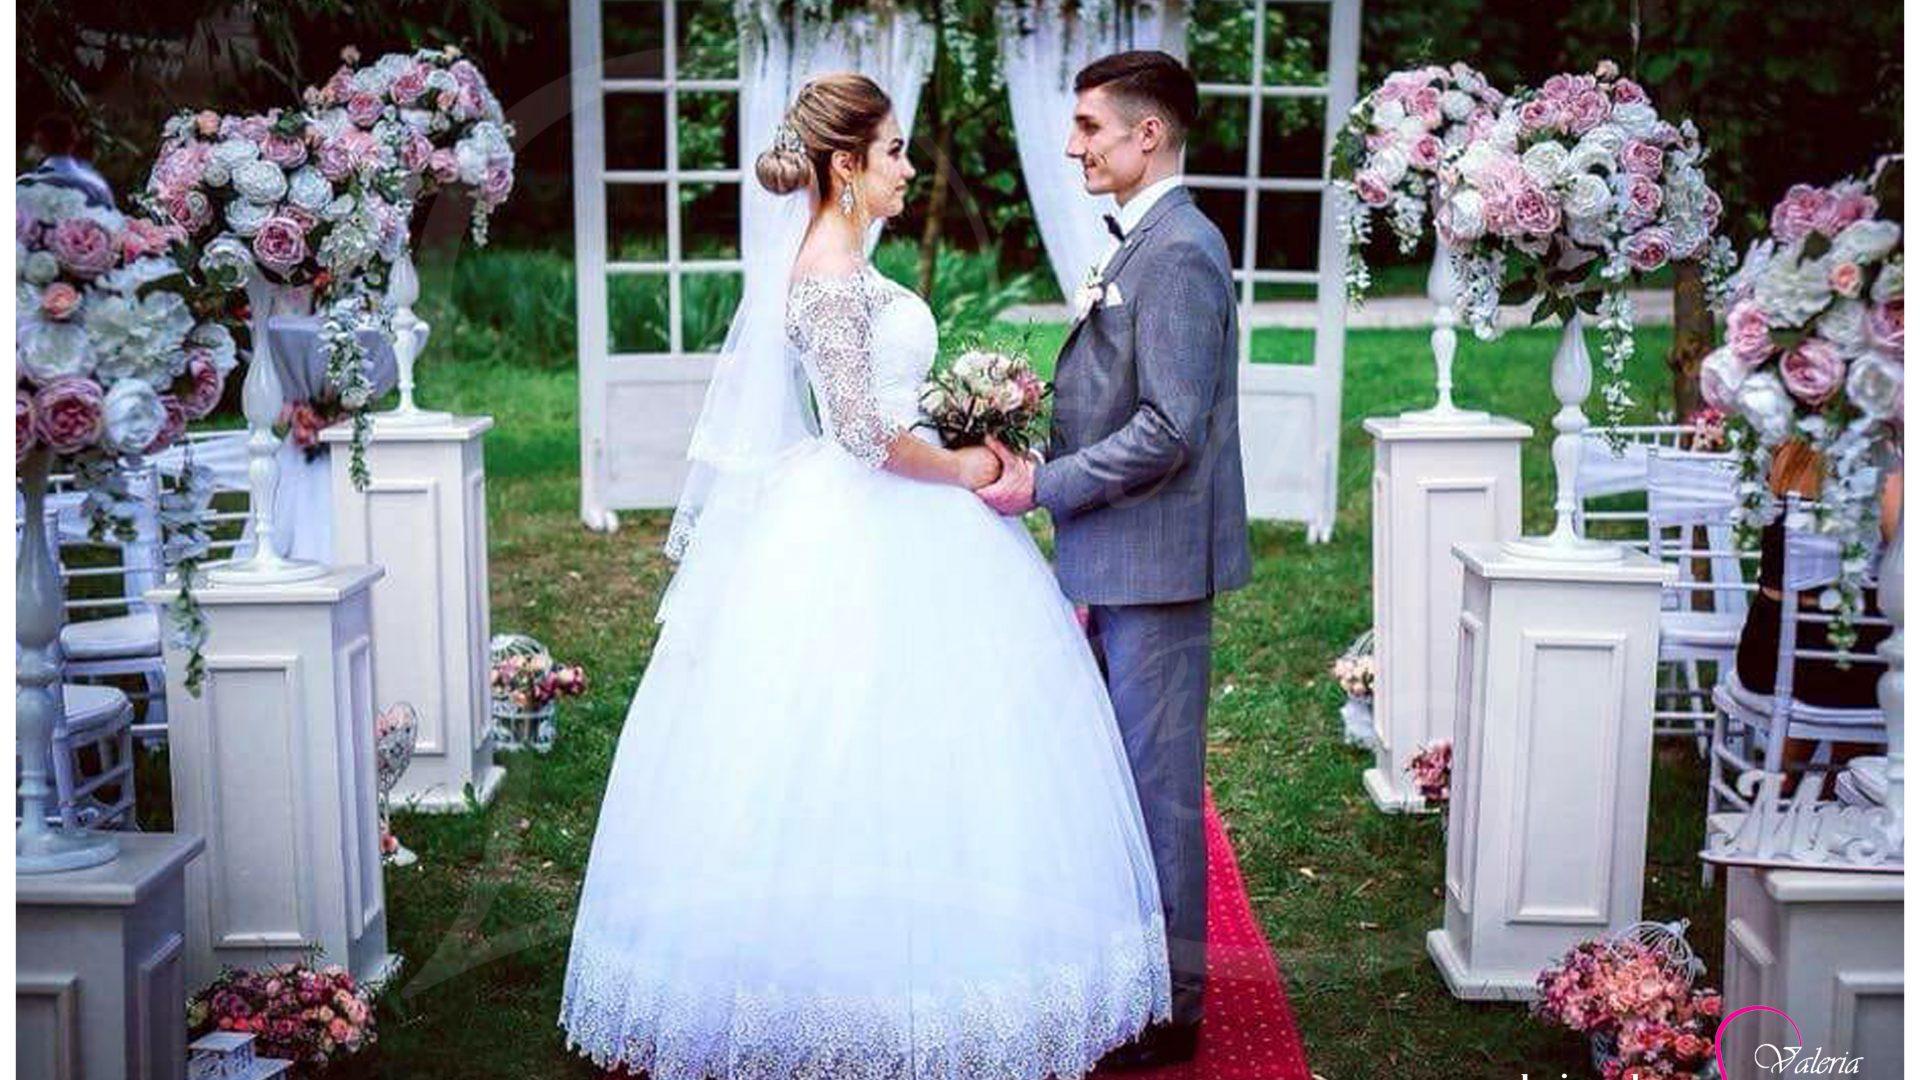 Inregistrarea casatoriei sub cerul liber Agentia Valeria Mariage 069787665 www.valeria (13)